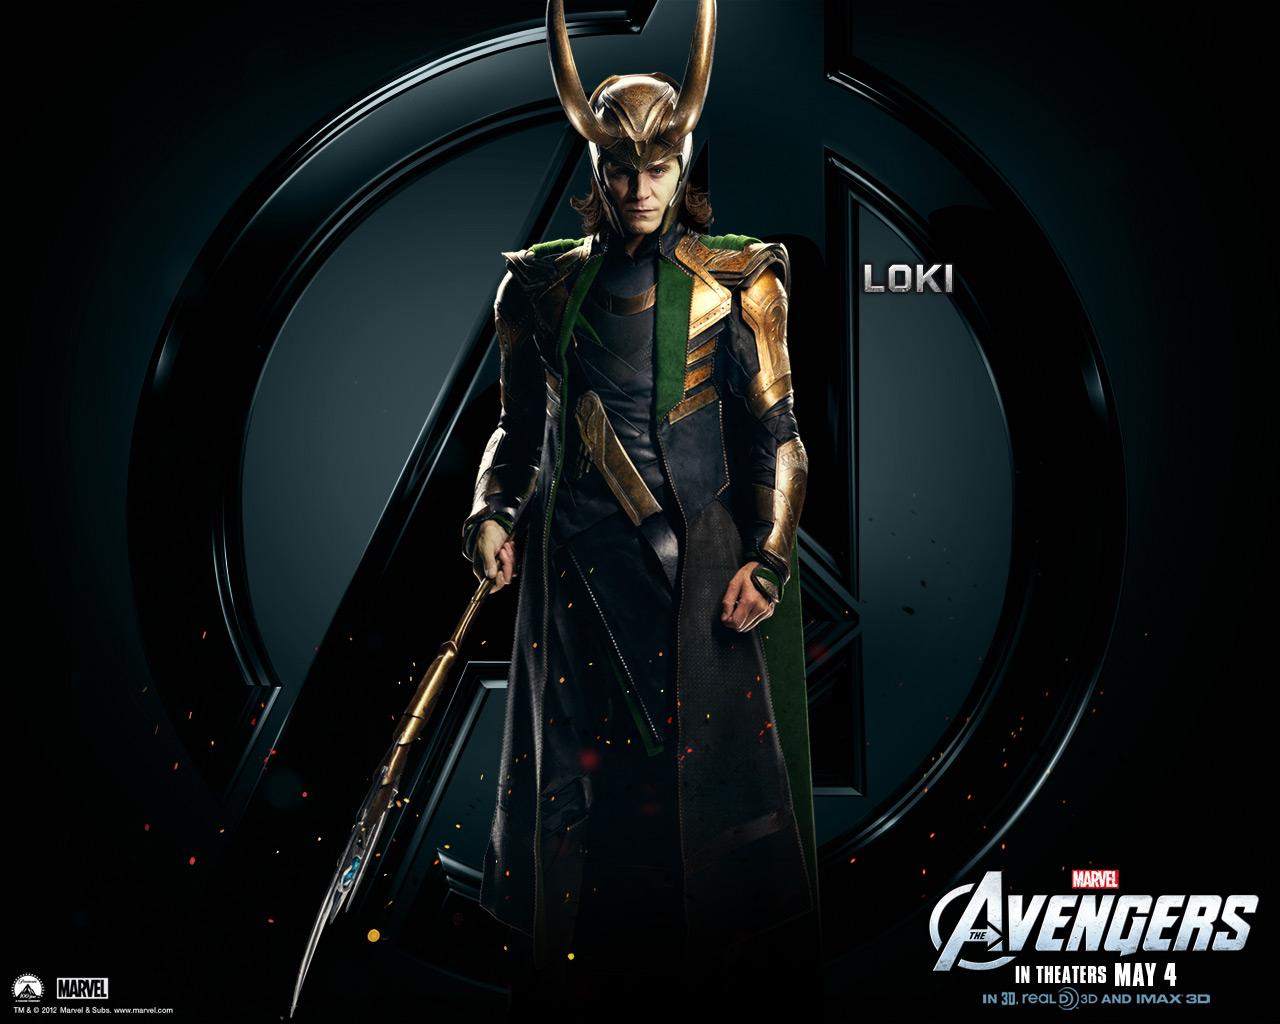 Loki   The Avengers Wallpaper 30730363 1280x1024